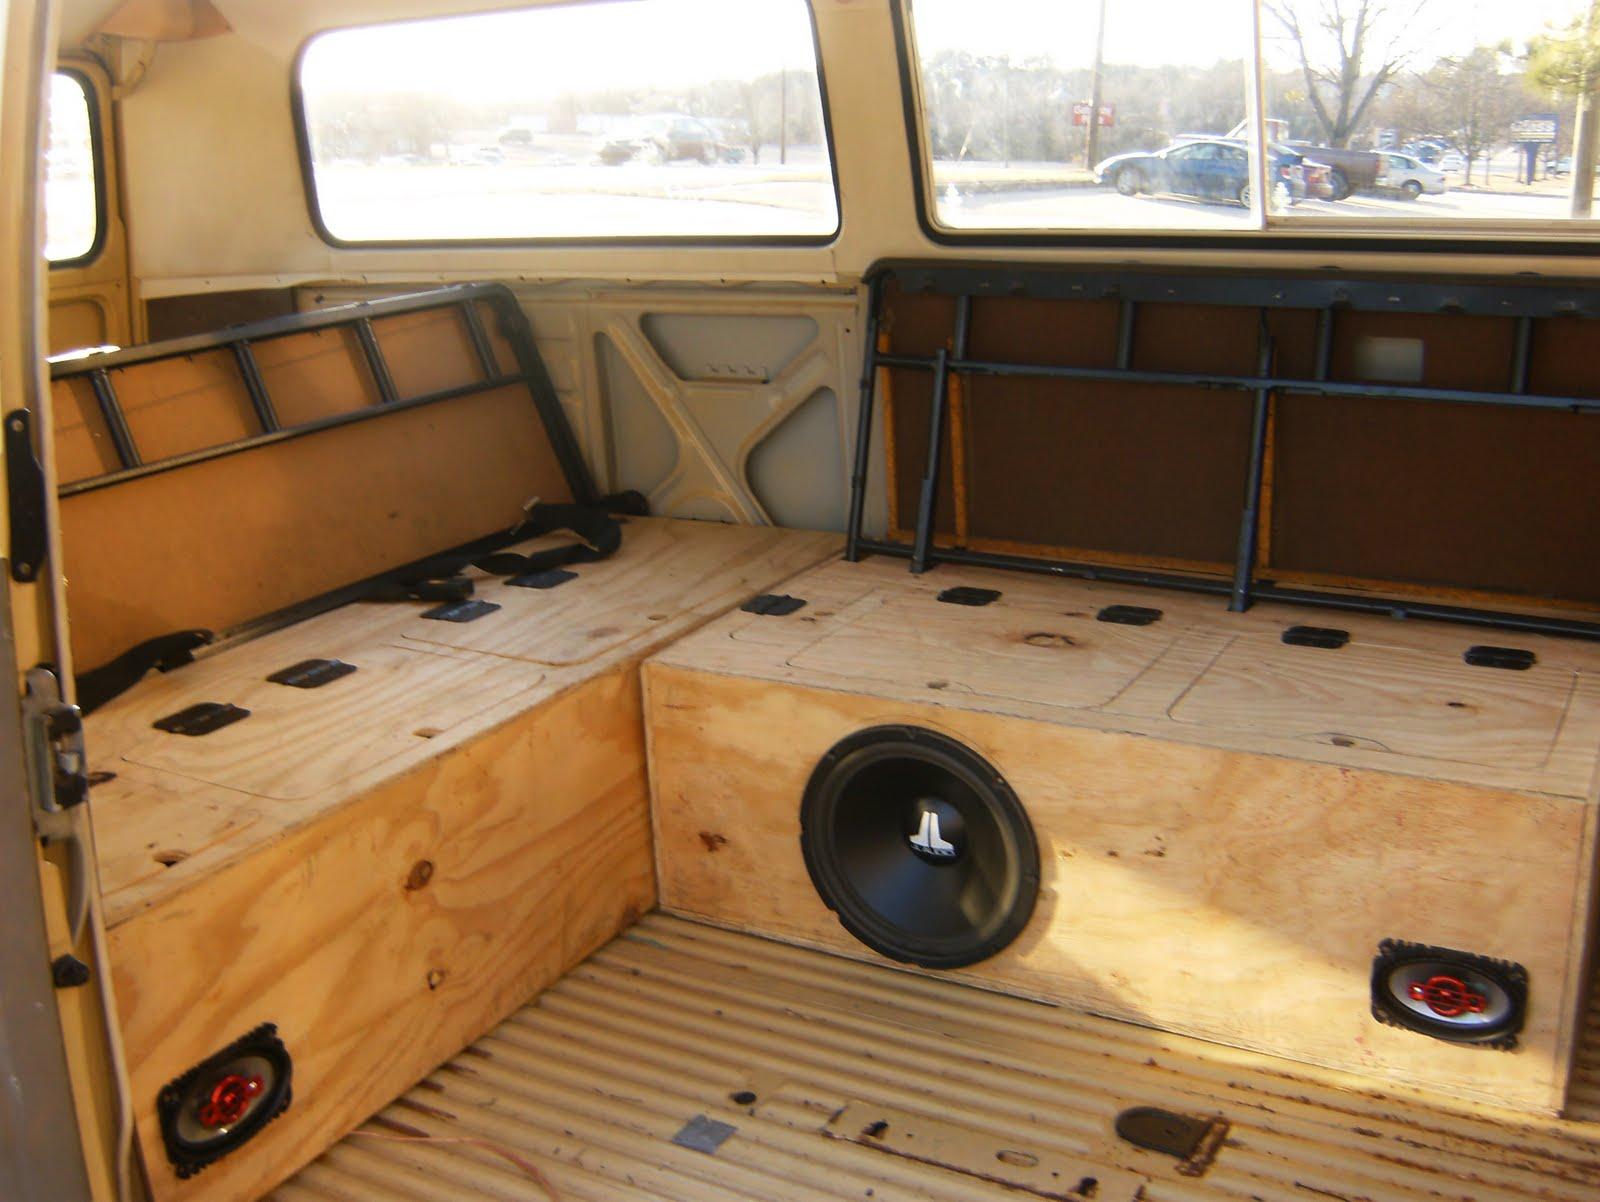 The adventures of betty the bus custom interior part 1 for Kombi van interior designs